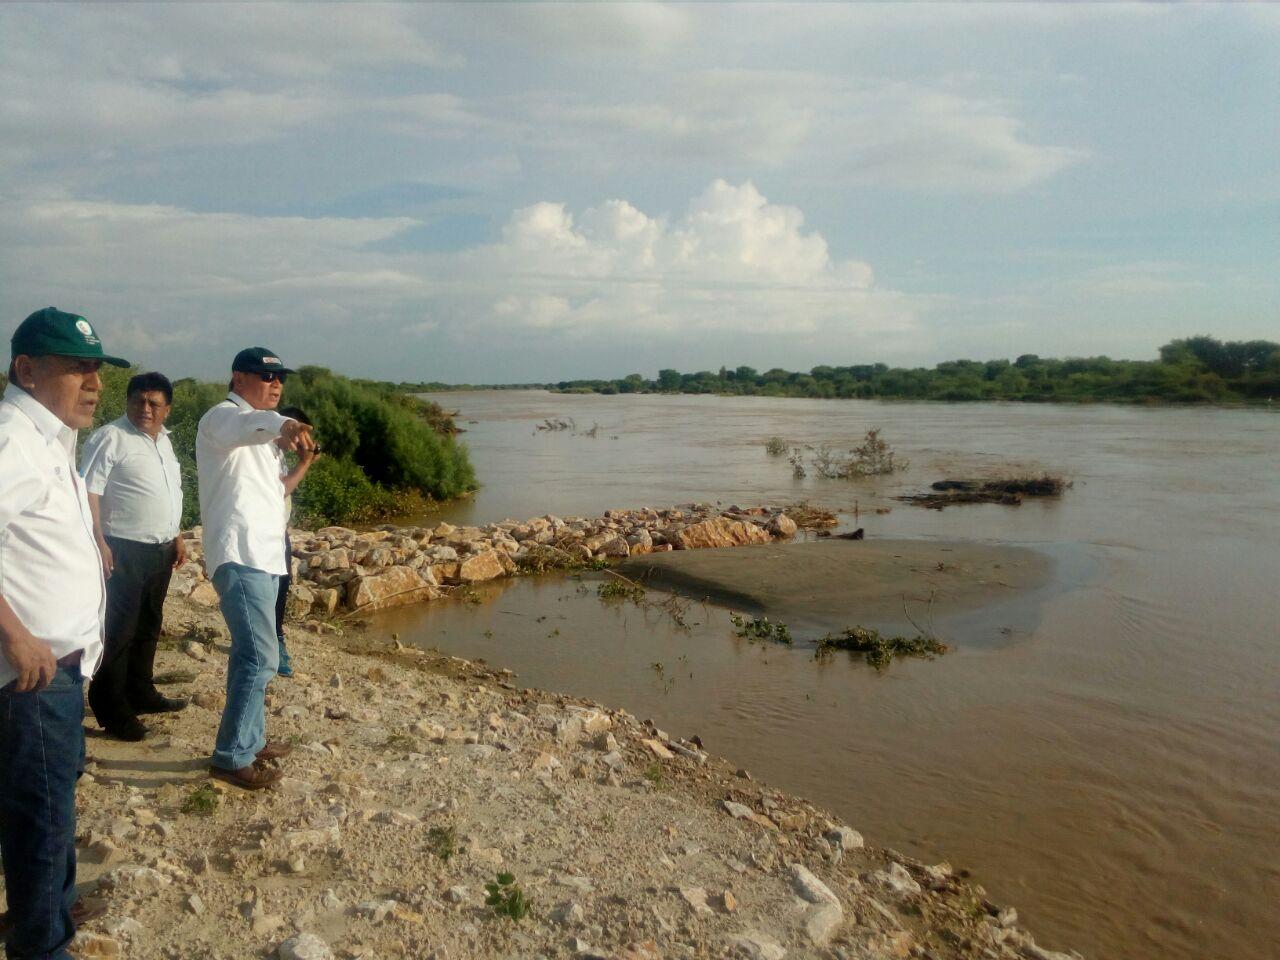 Minagri inicia obras para recuperar 2.800 hectáreas de terrenos agrícolas d5c00acae6a